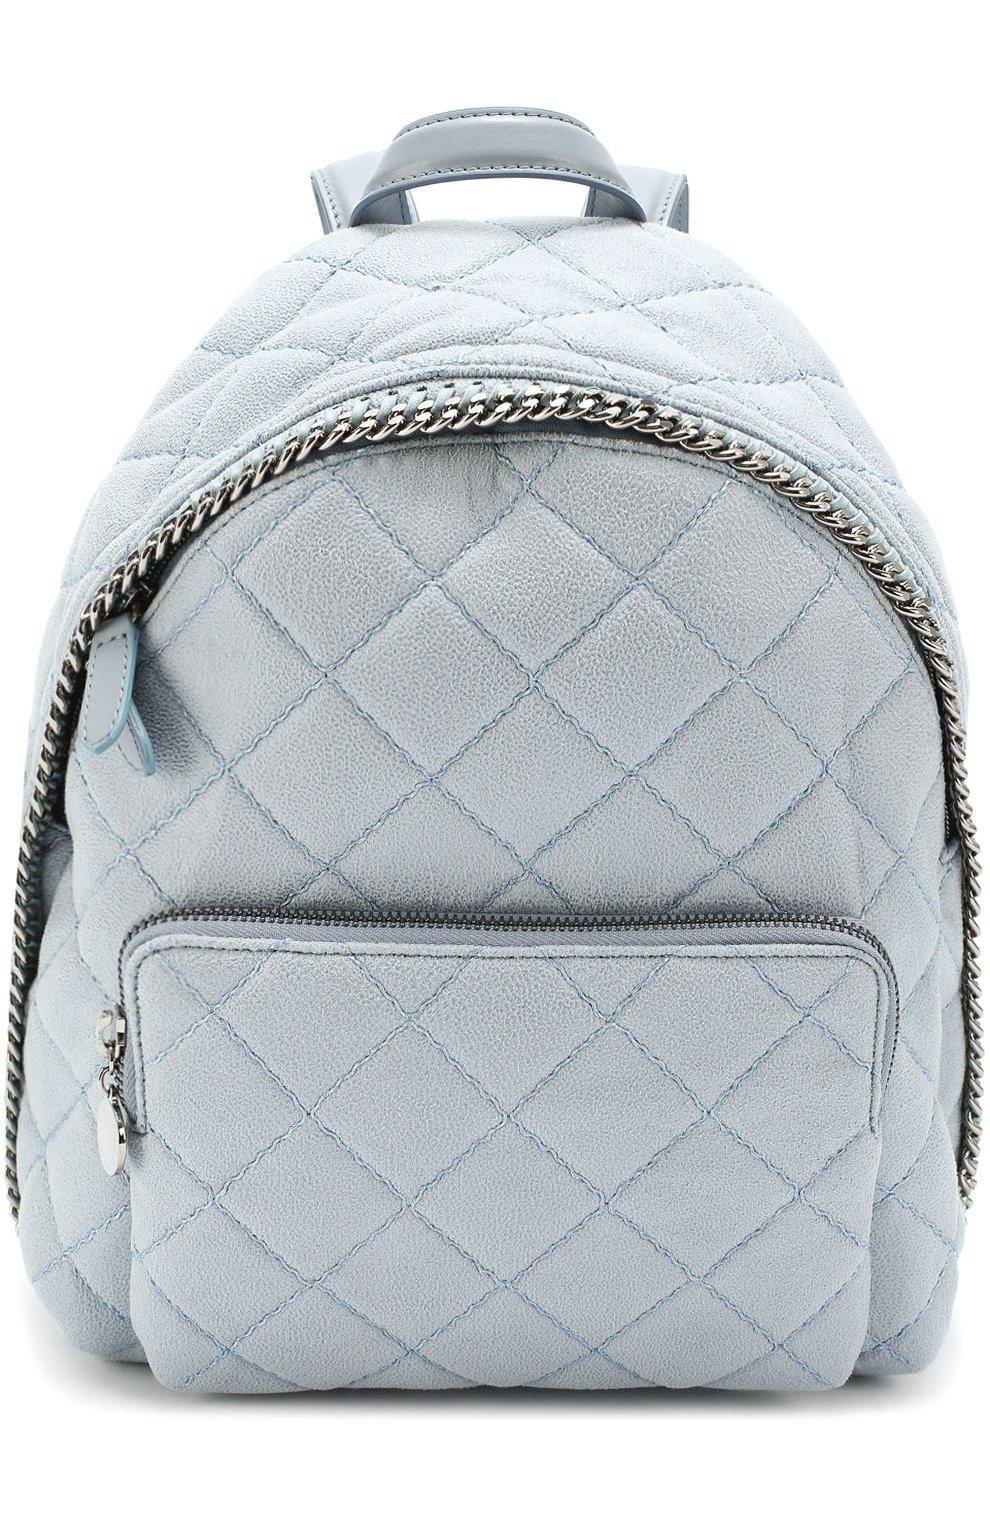 2dde3c44a377 Стеганый рюкзак Falabella mini из эко-кожи Stella McCartney светло-голубой  | Фото №